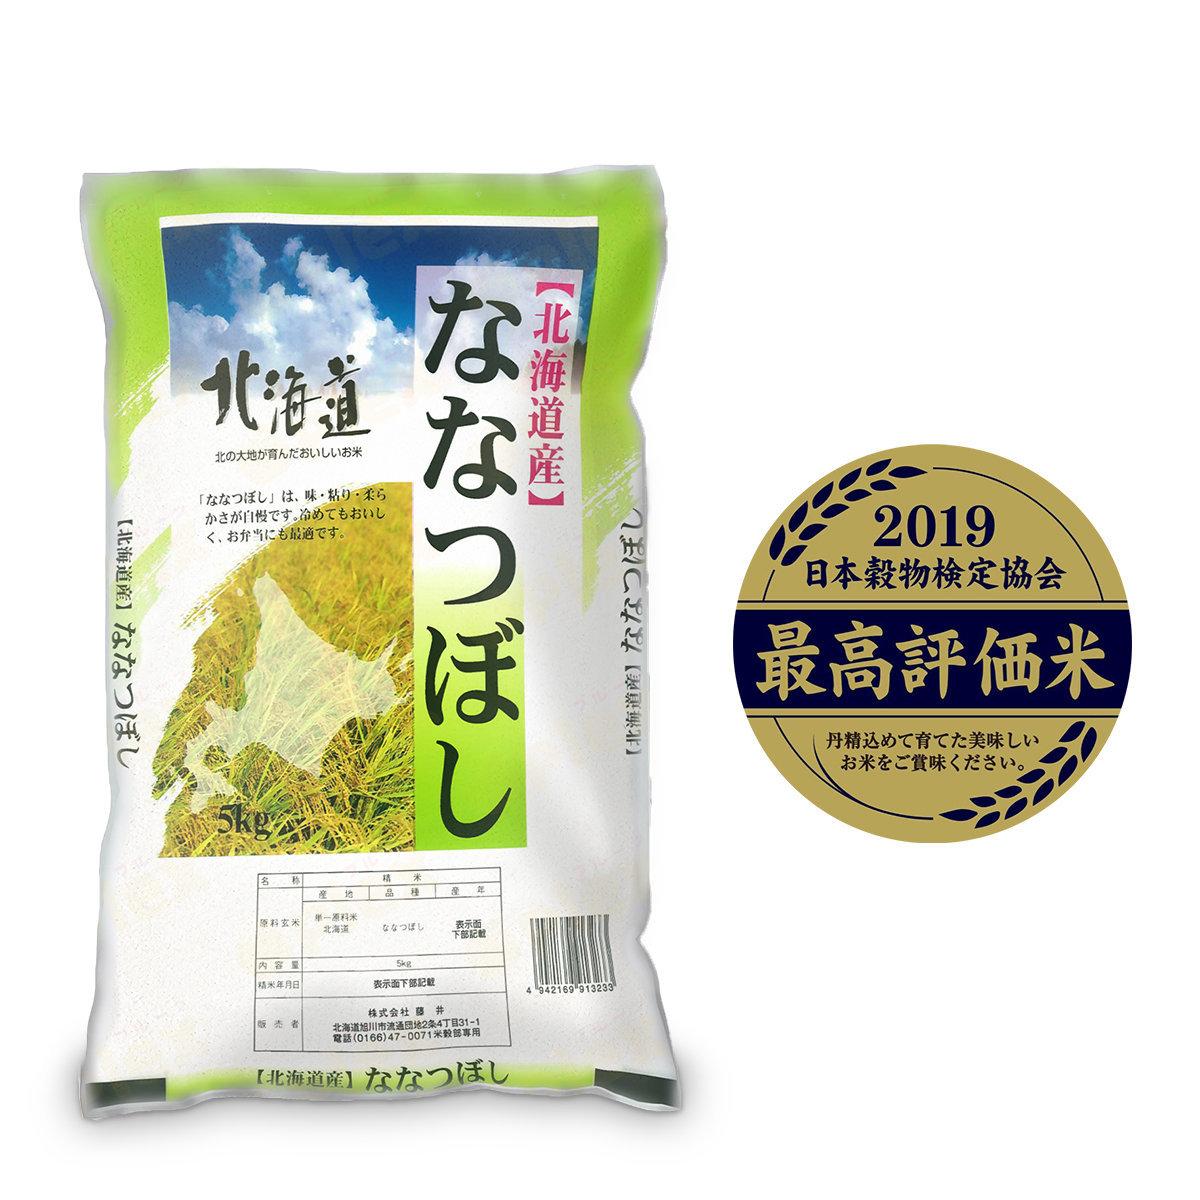 "「2019 Gold Award」Hokkaido Japan Rice ""ななつぼし Nanatsuboshi"" Rice (5kg)"